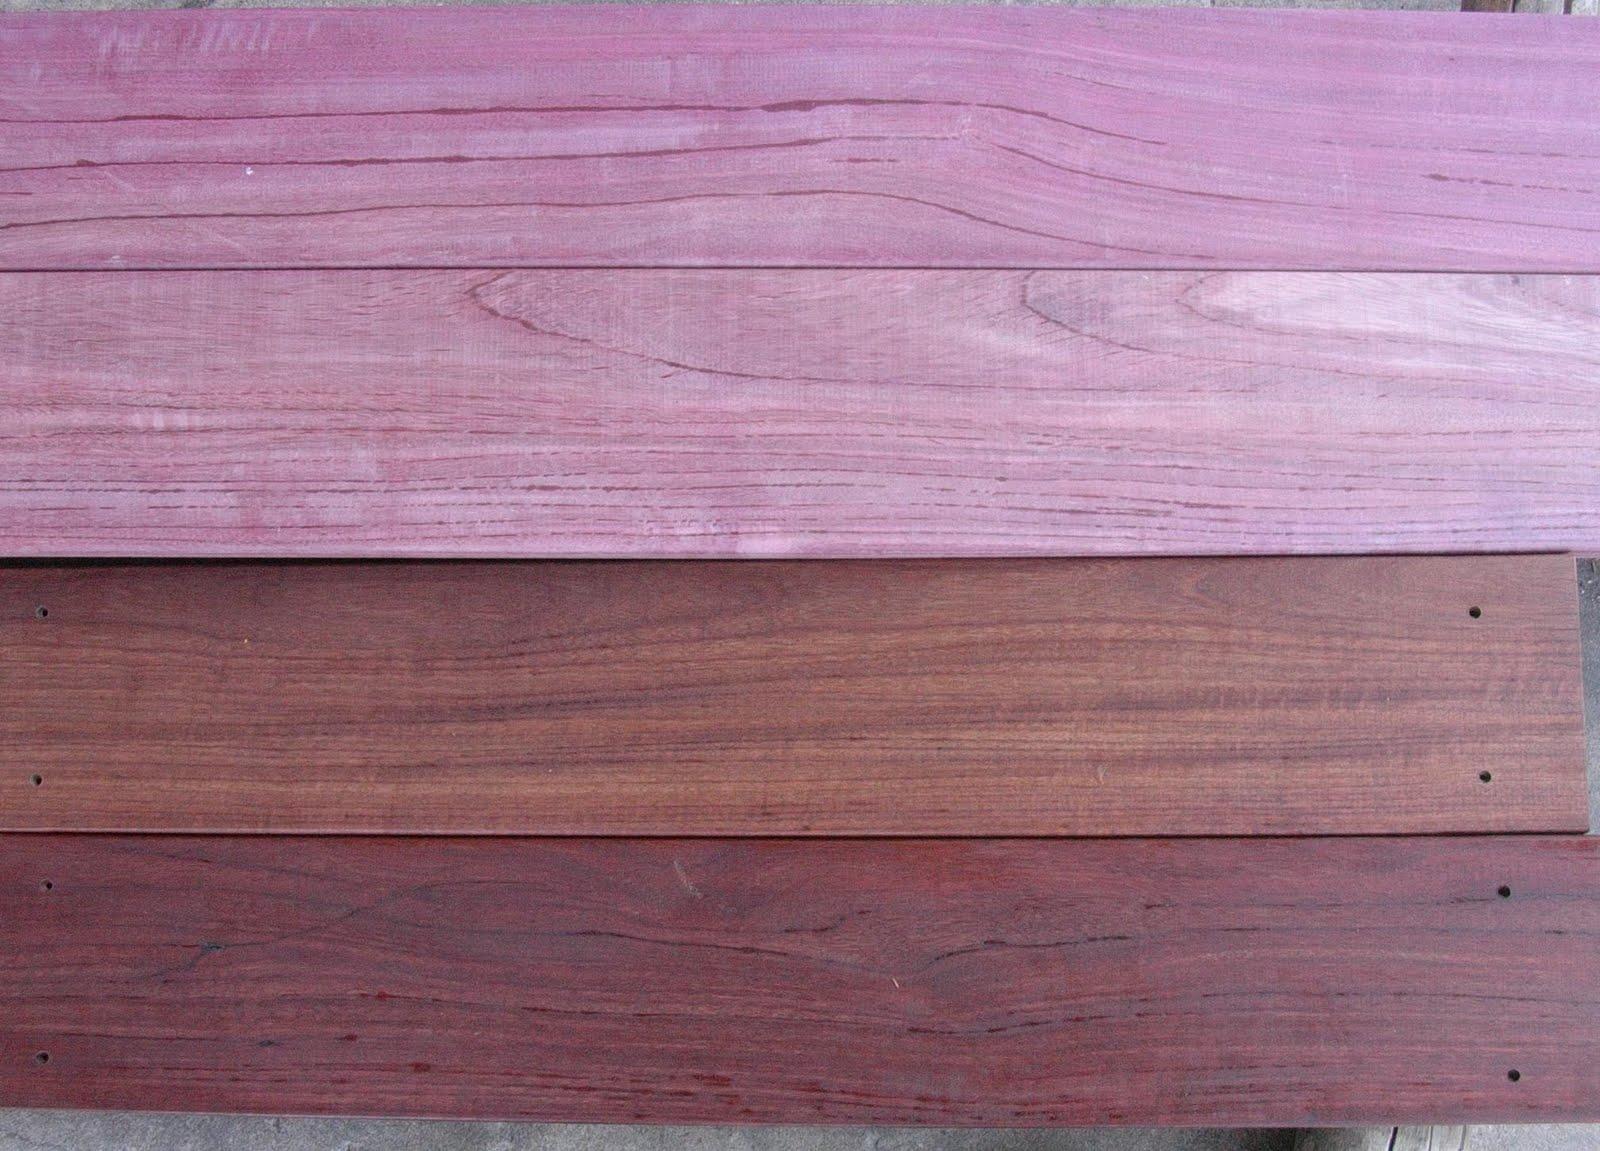 Brazilian Hardwood Decking Purple Heart Hardwood Decking